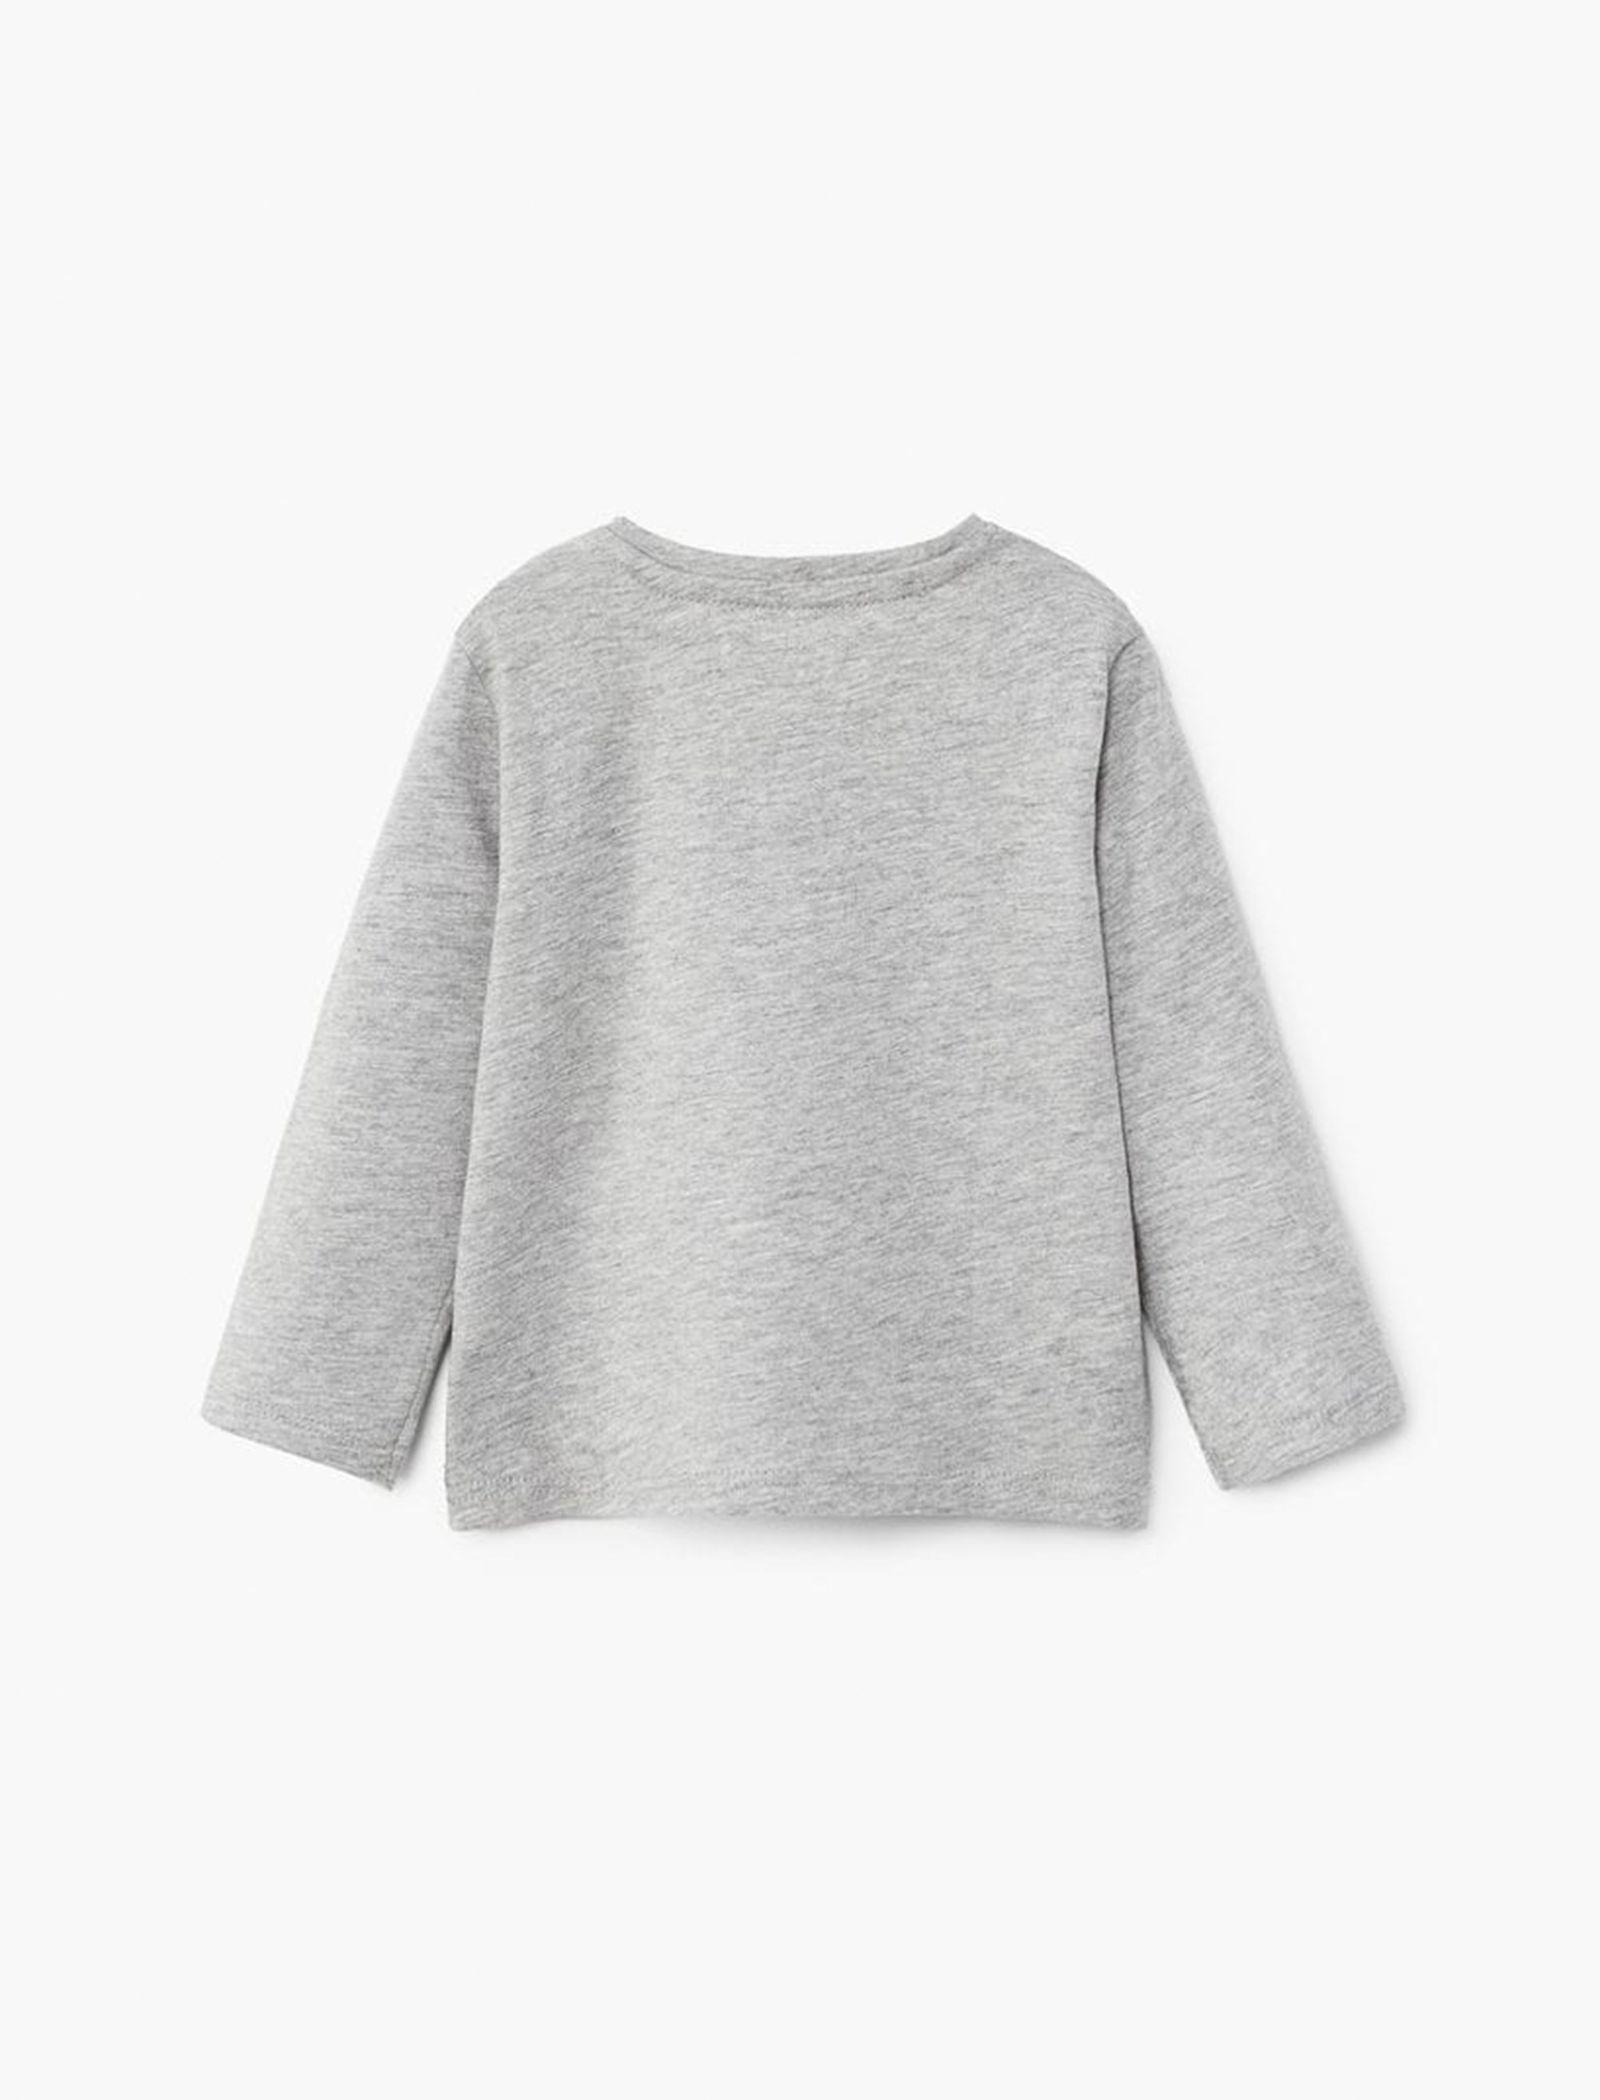 تی شرت و شلوار نخی پسرانه - مانگو - طوسي - 3